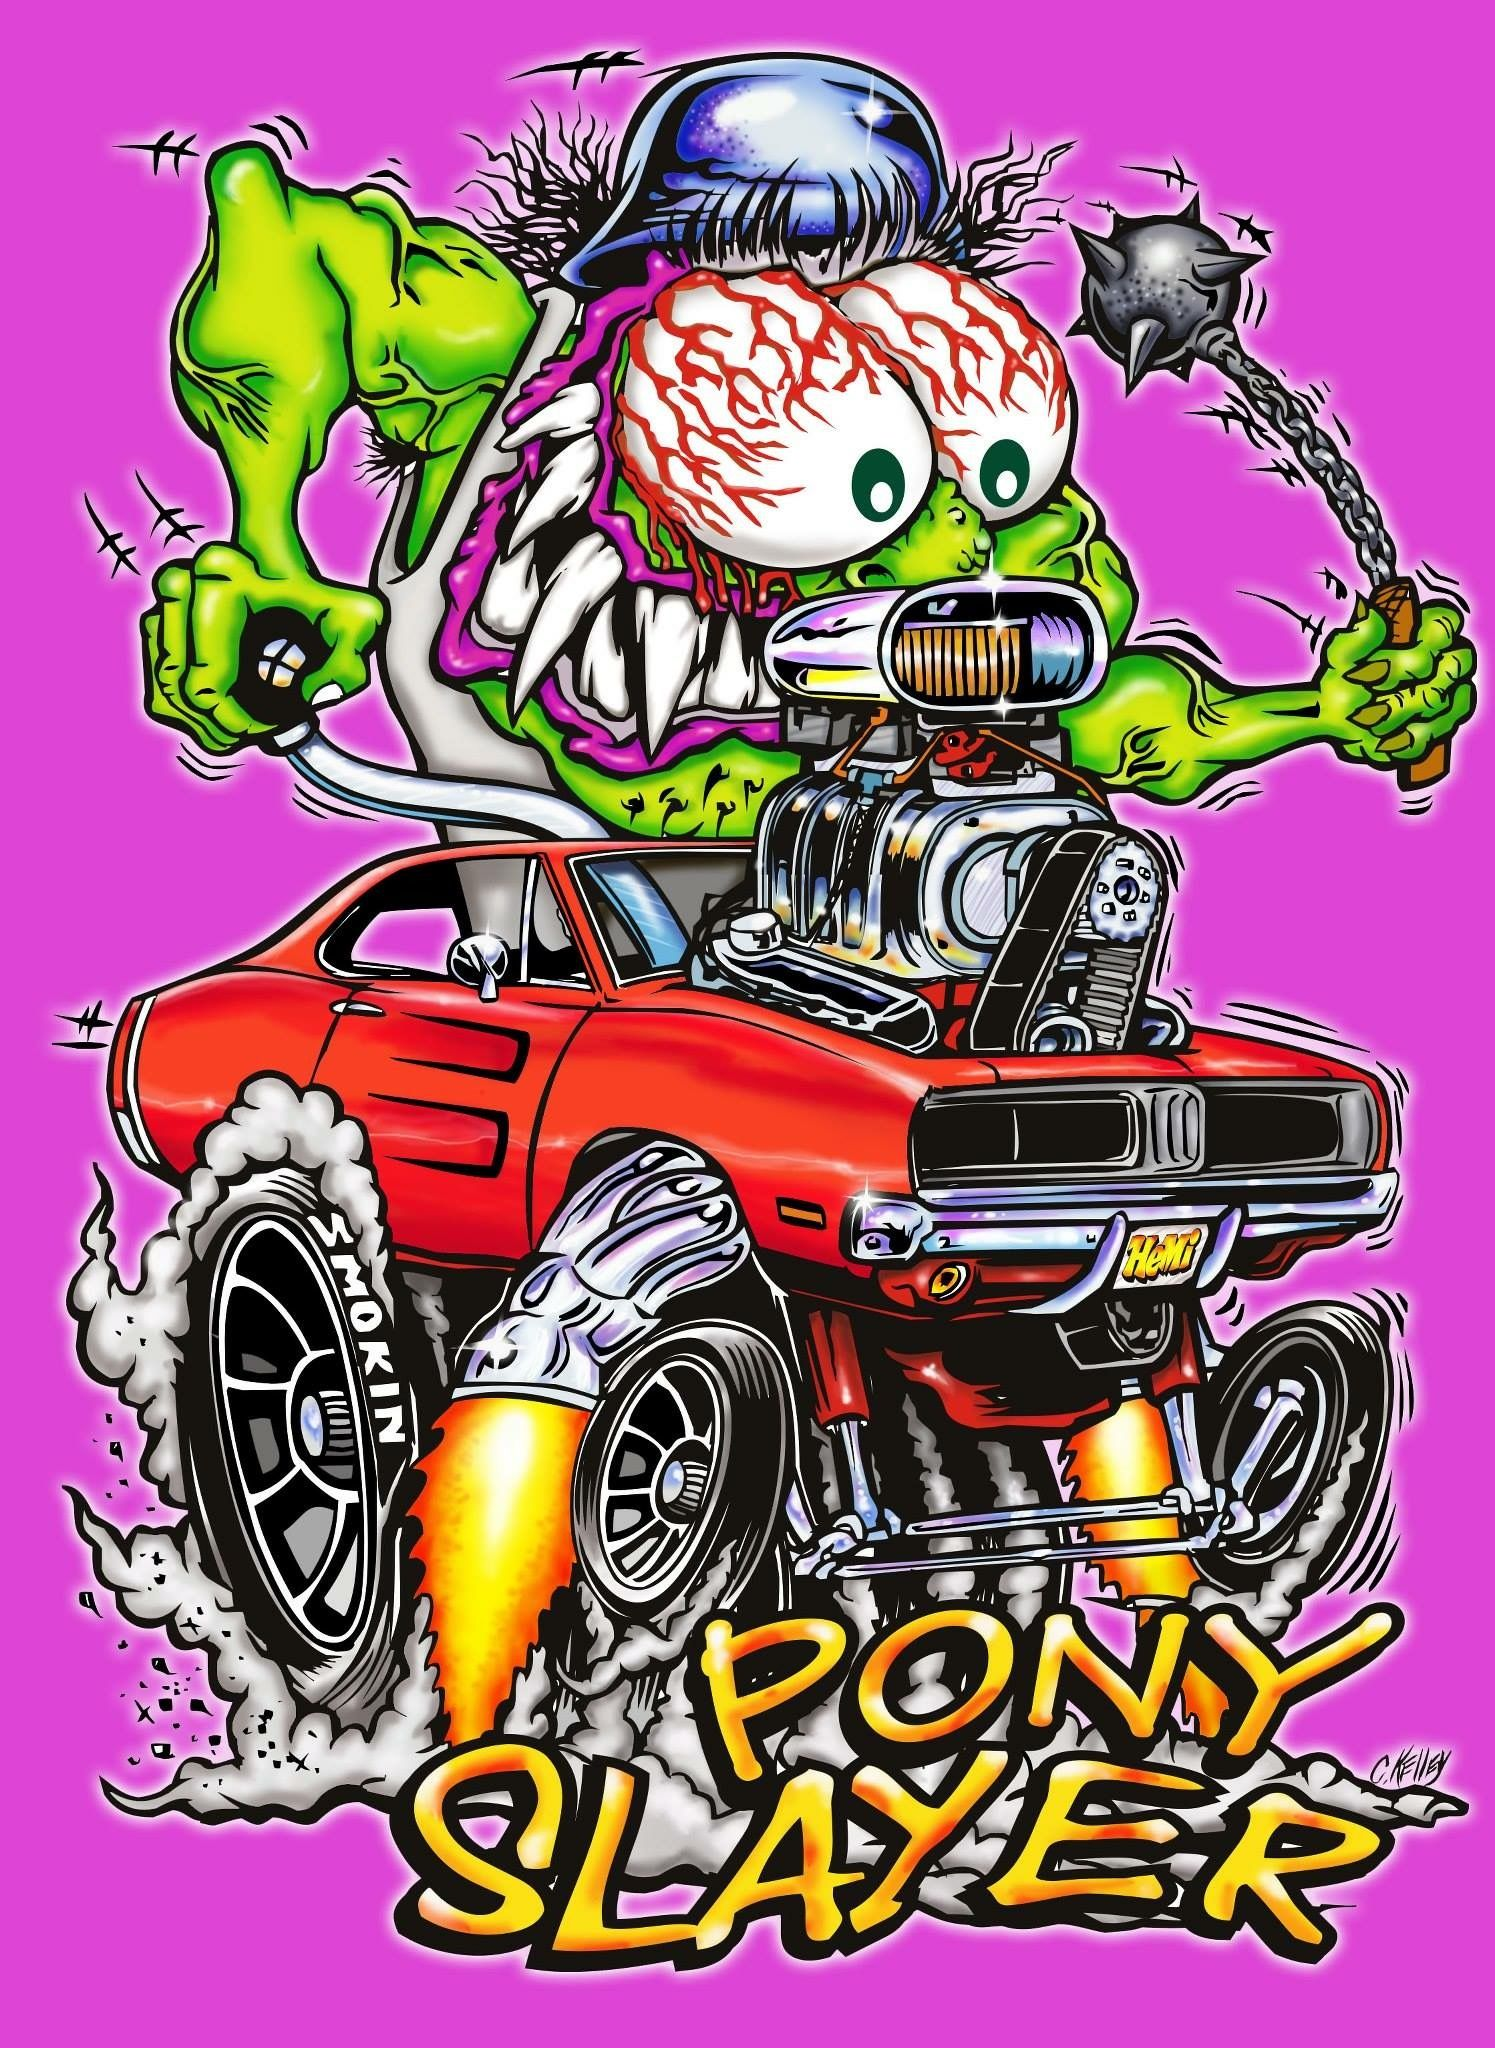 Pin by mike jansen on Hot rod | Rat fink, Garage art ...